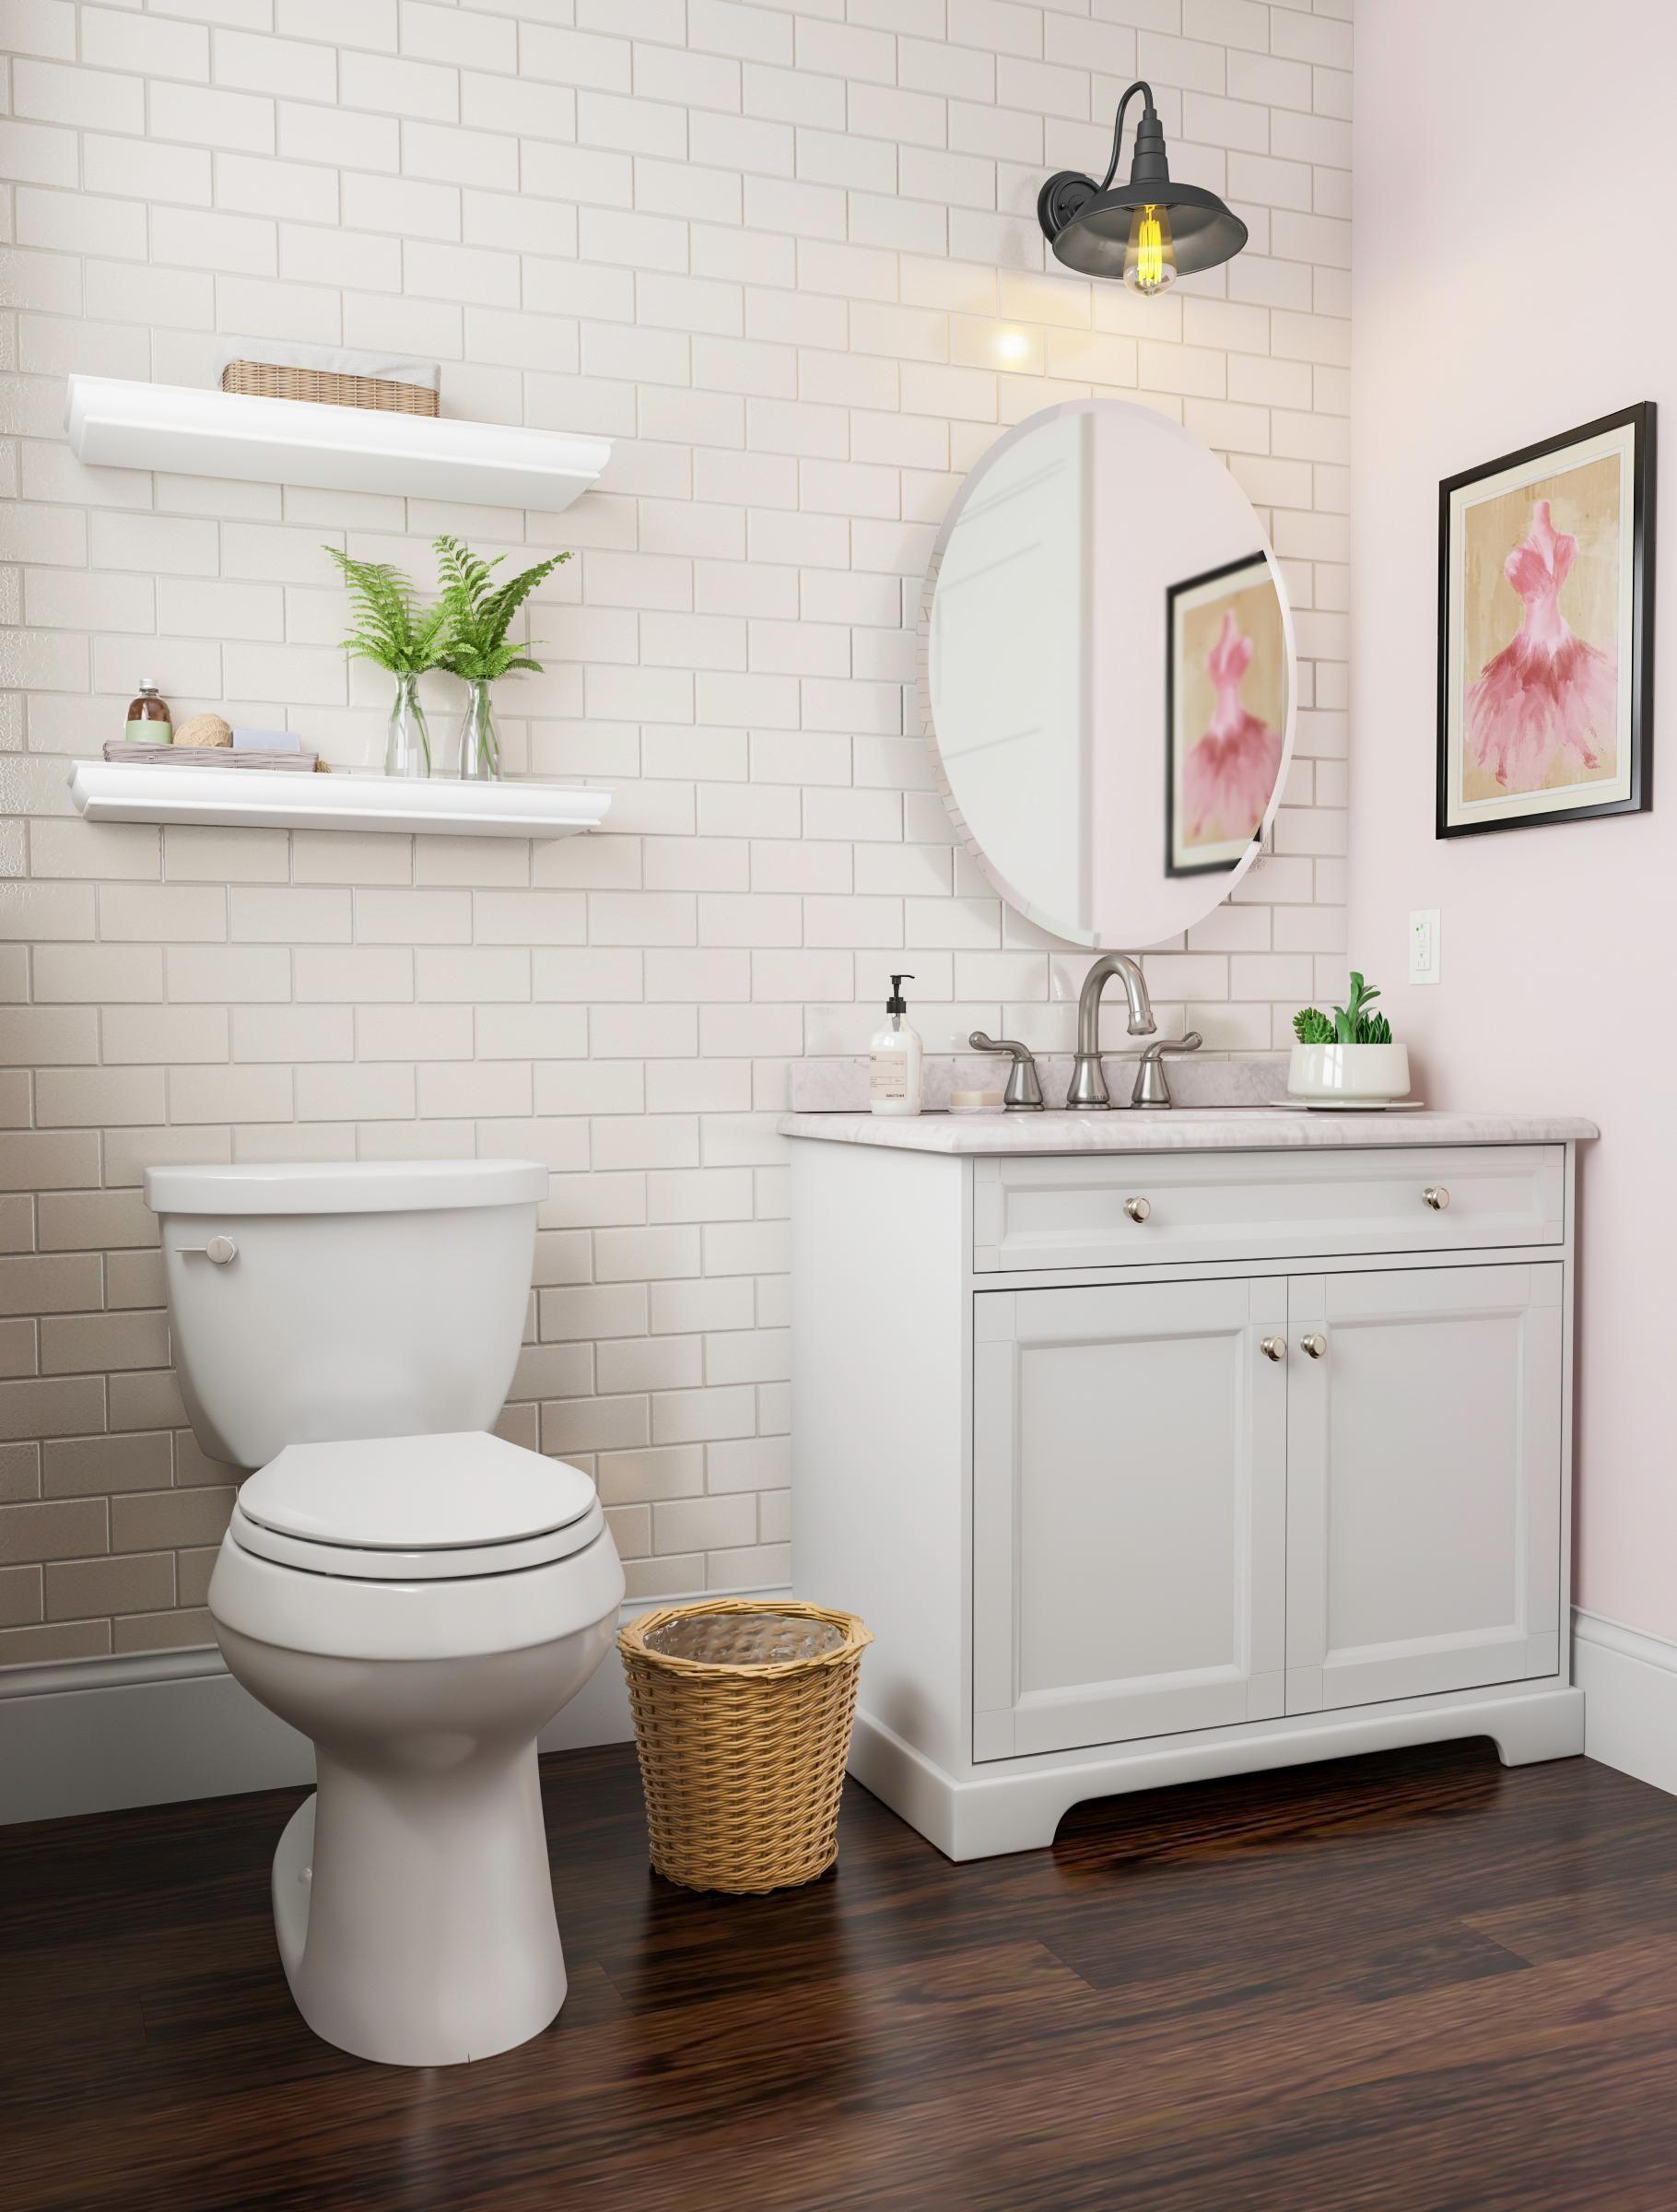 Bathroom Bathroom Design Bathroom Design Tool Bathroom Ideas Bathroom Ideas Decor Bathroom Things B In 2020 Guest Bathroom Small Half Bathroom Bathrooms Remodel